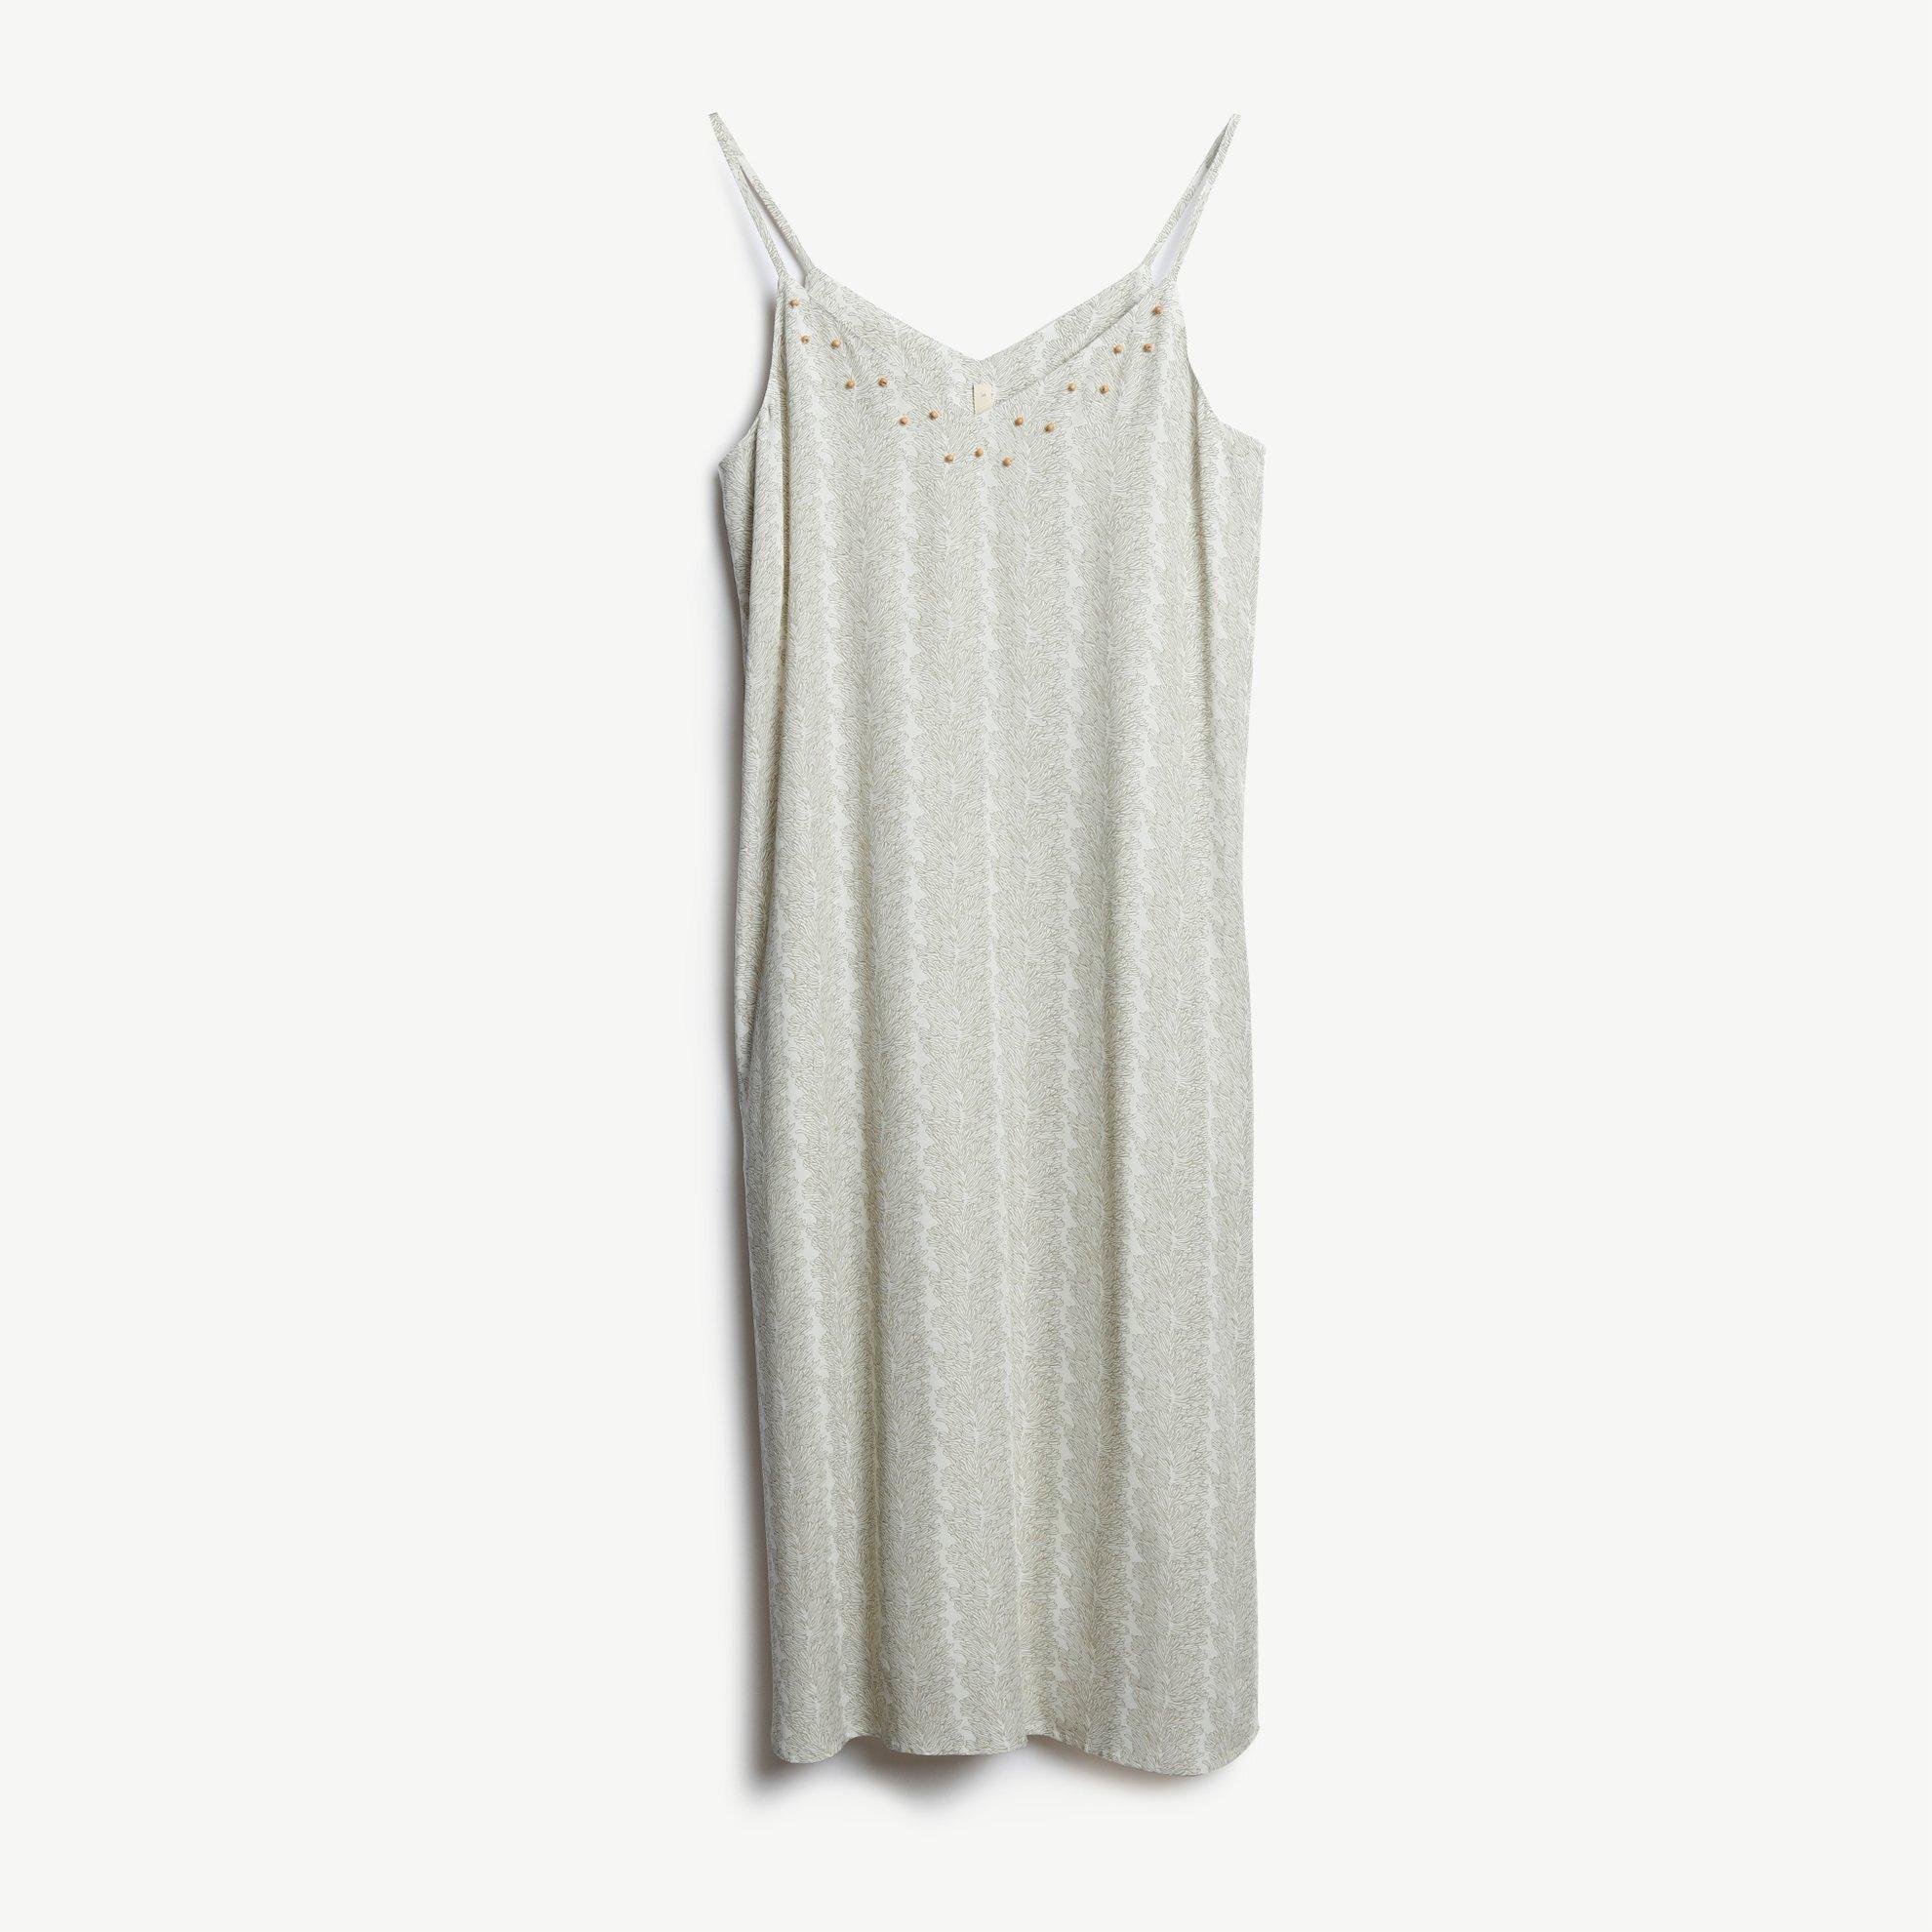 Strap Detailed Dress